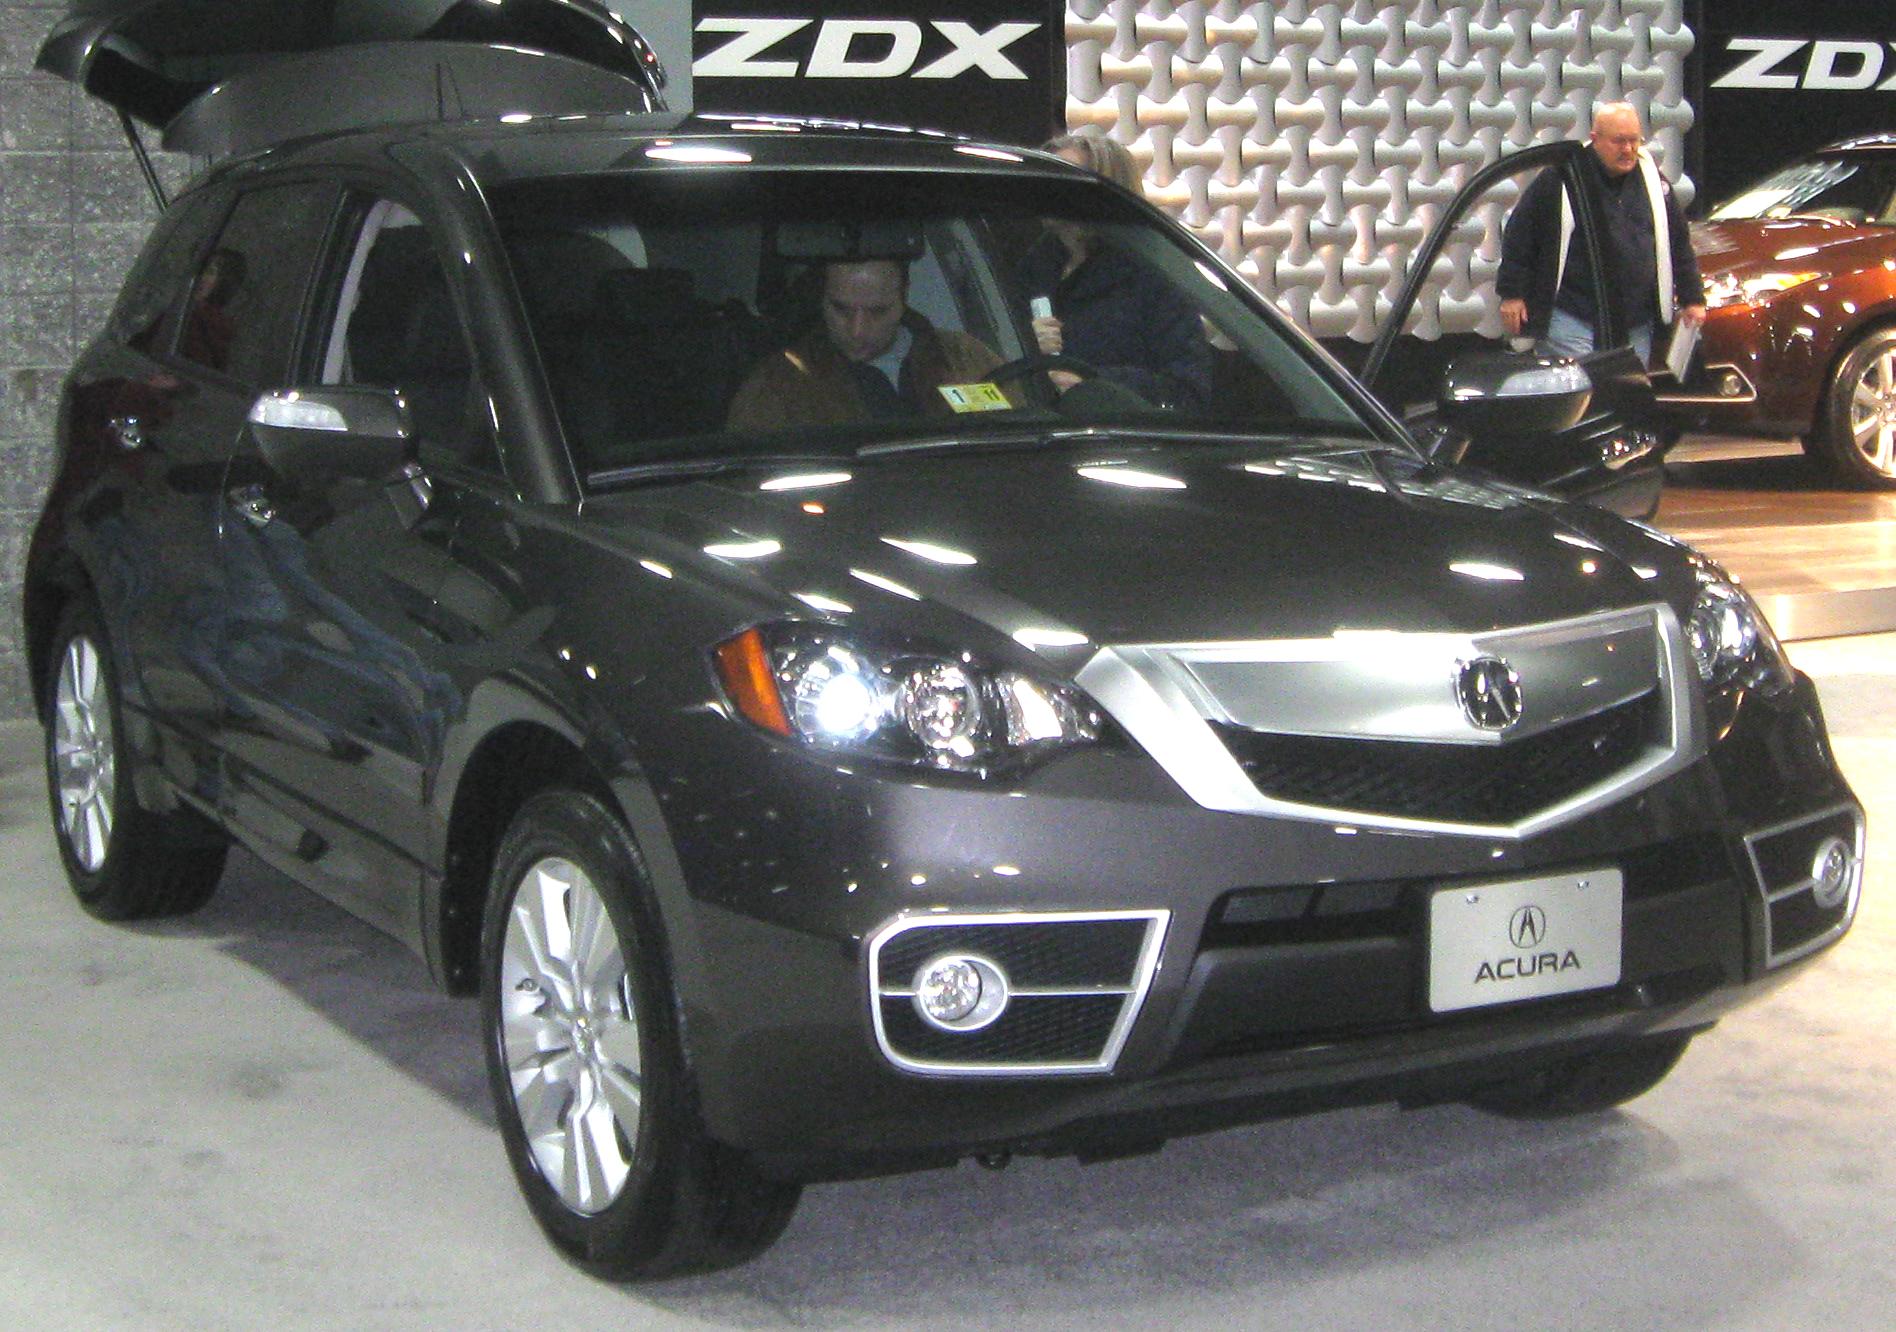 File:2010 Acura RDX -- 2010 DC.jpg